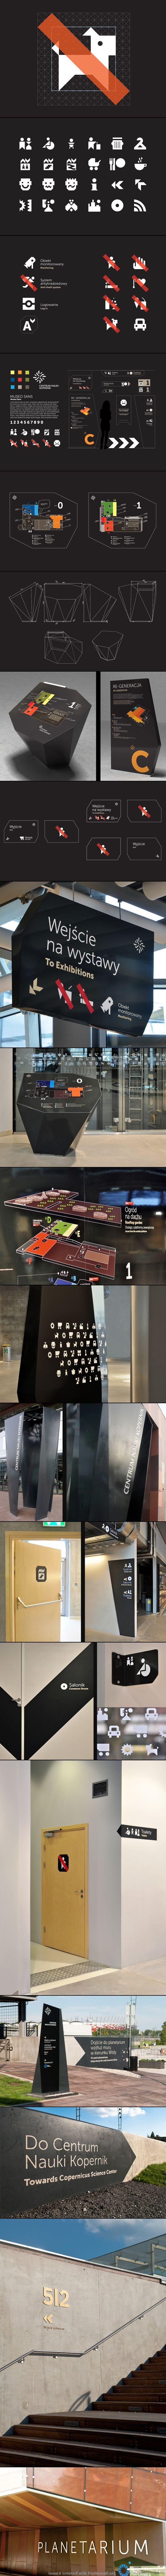 Copernicus Science Center - Visual information system